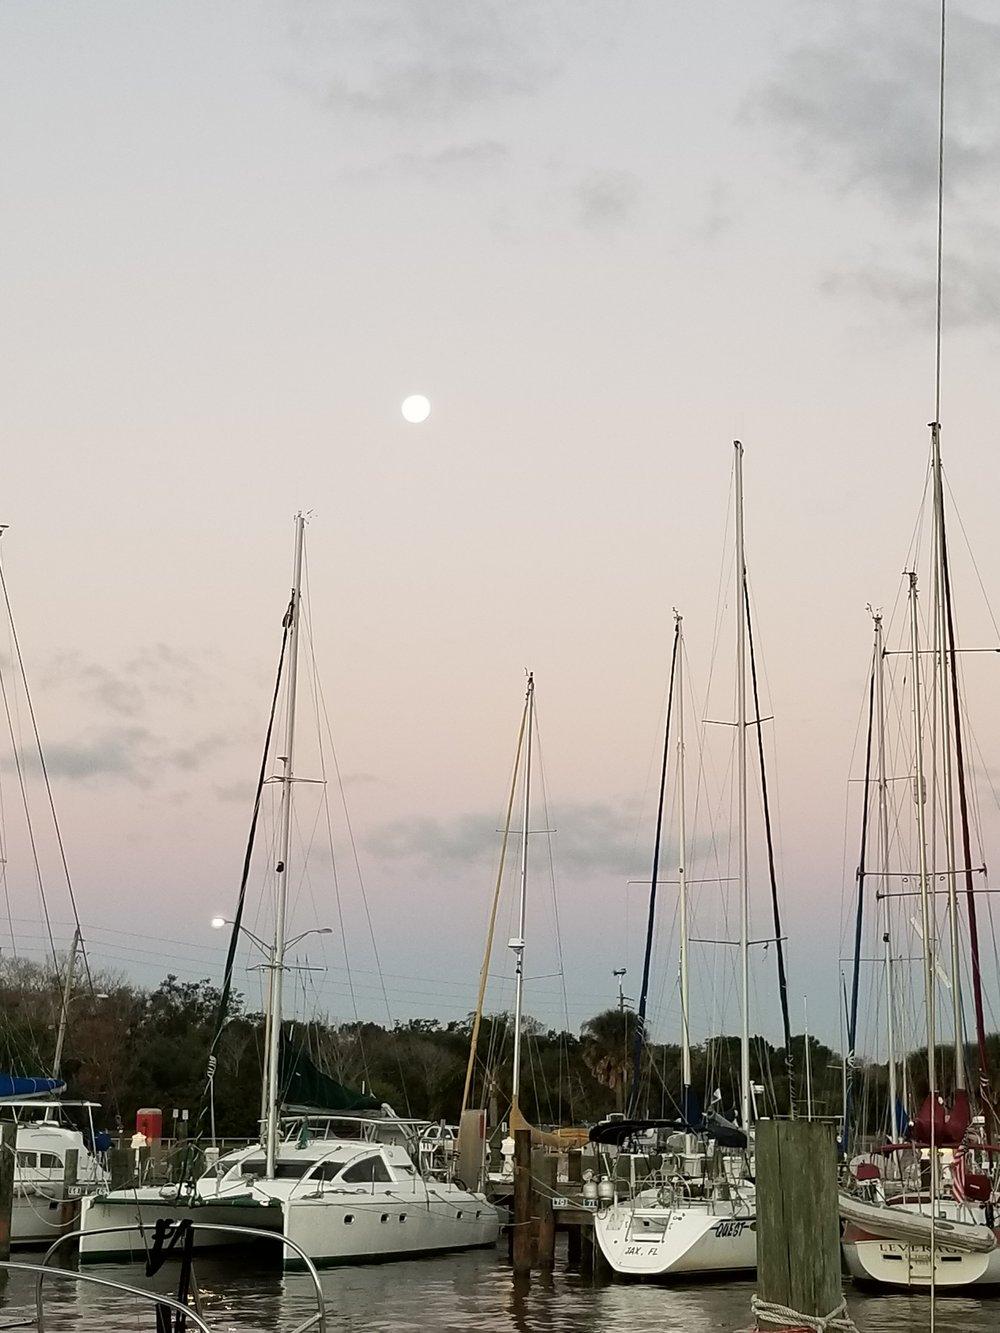 Full moon still shining brightly in the western sky as dawn breaks behind me.